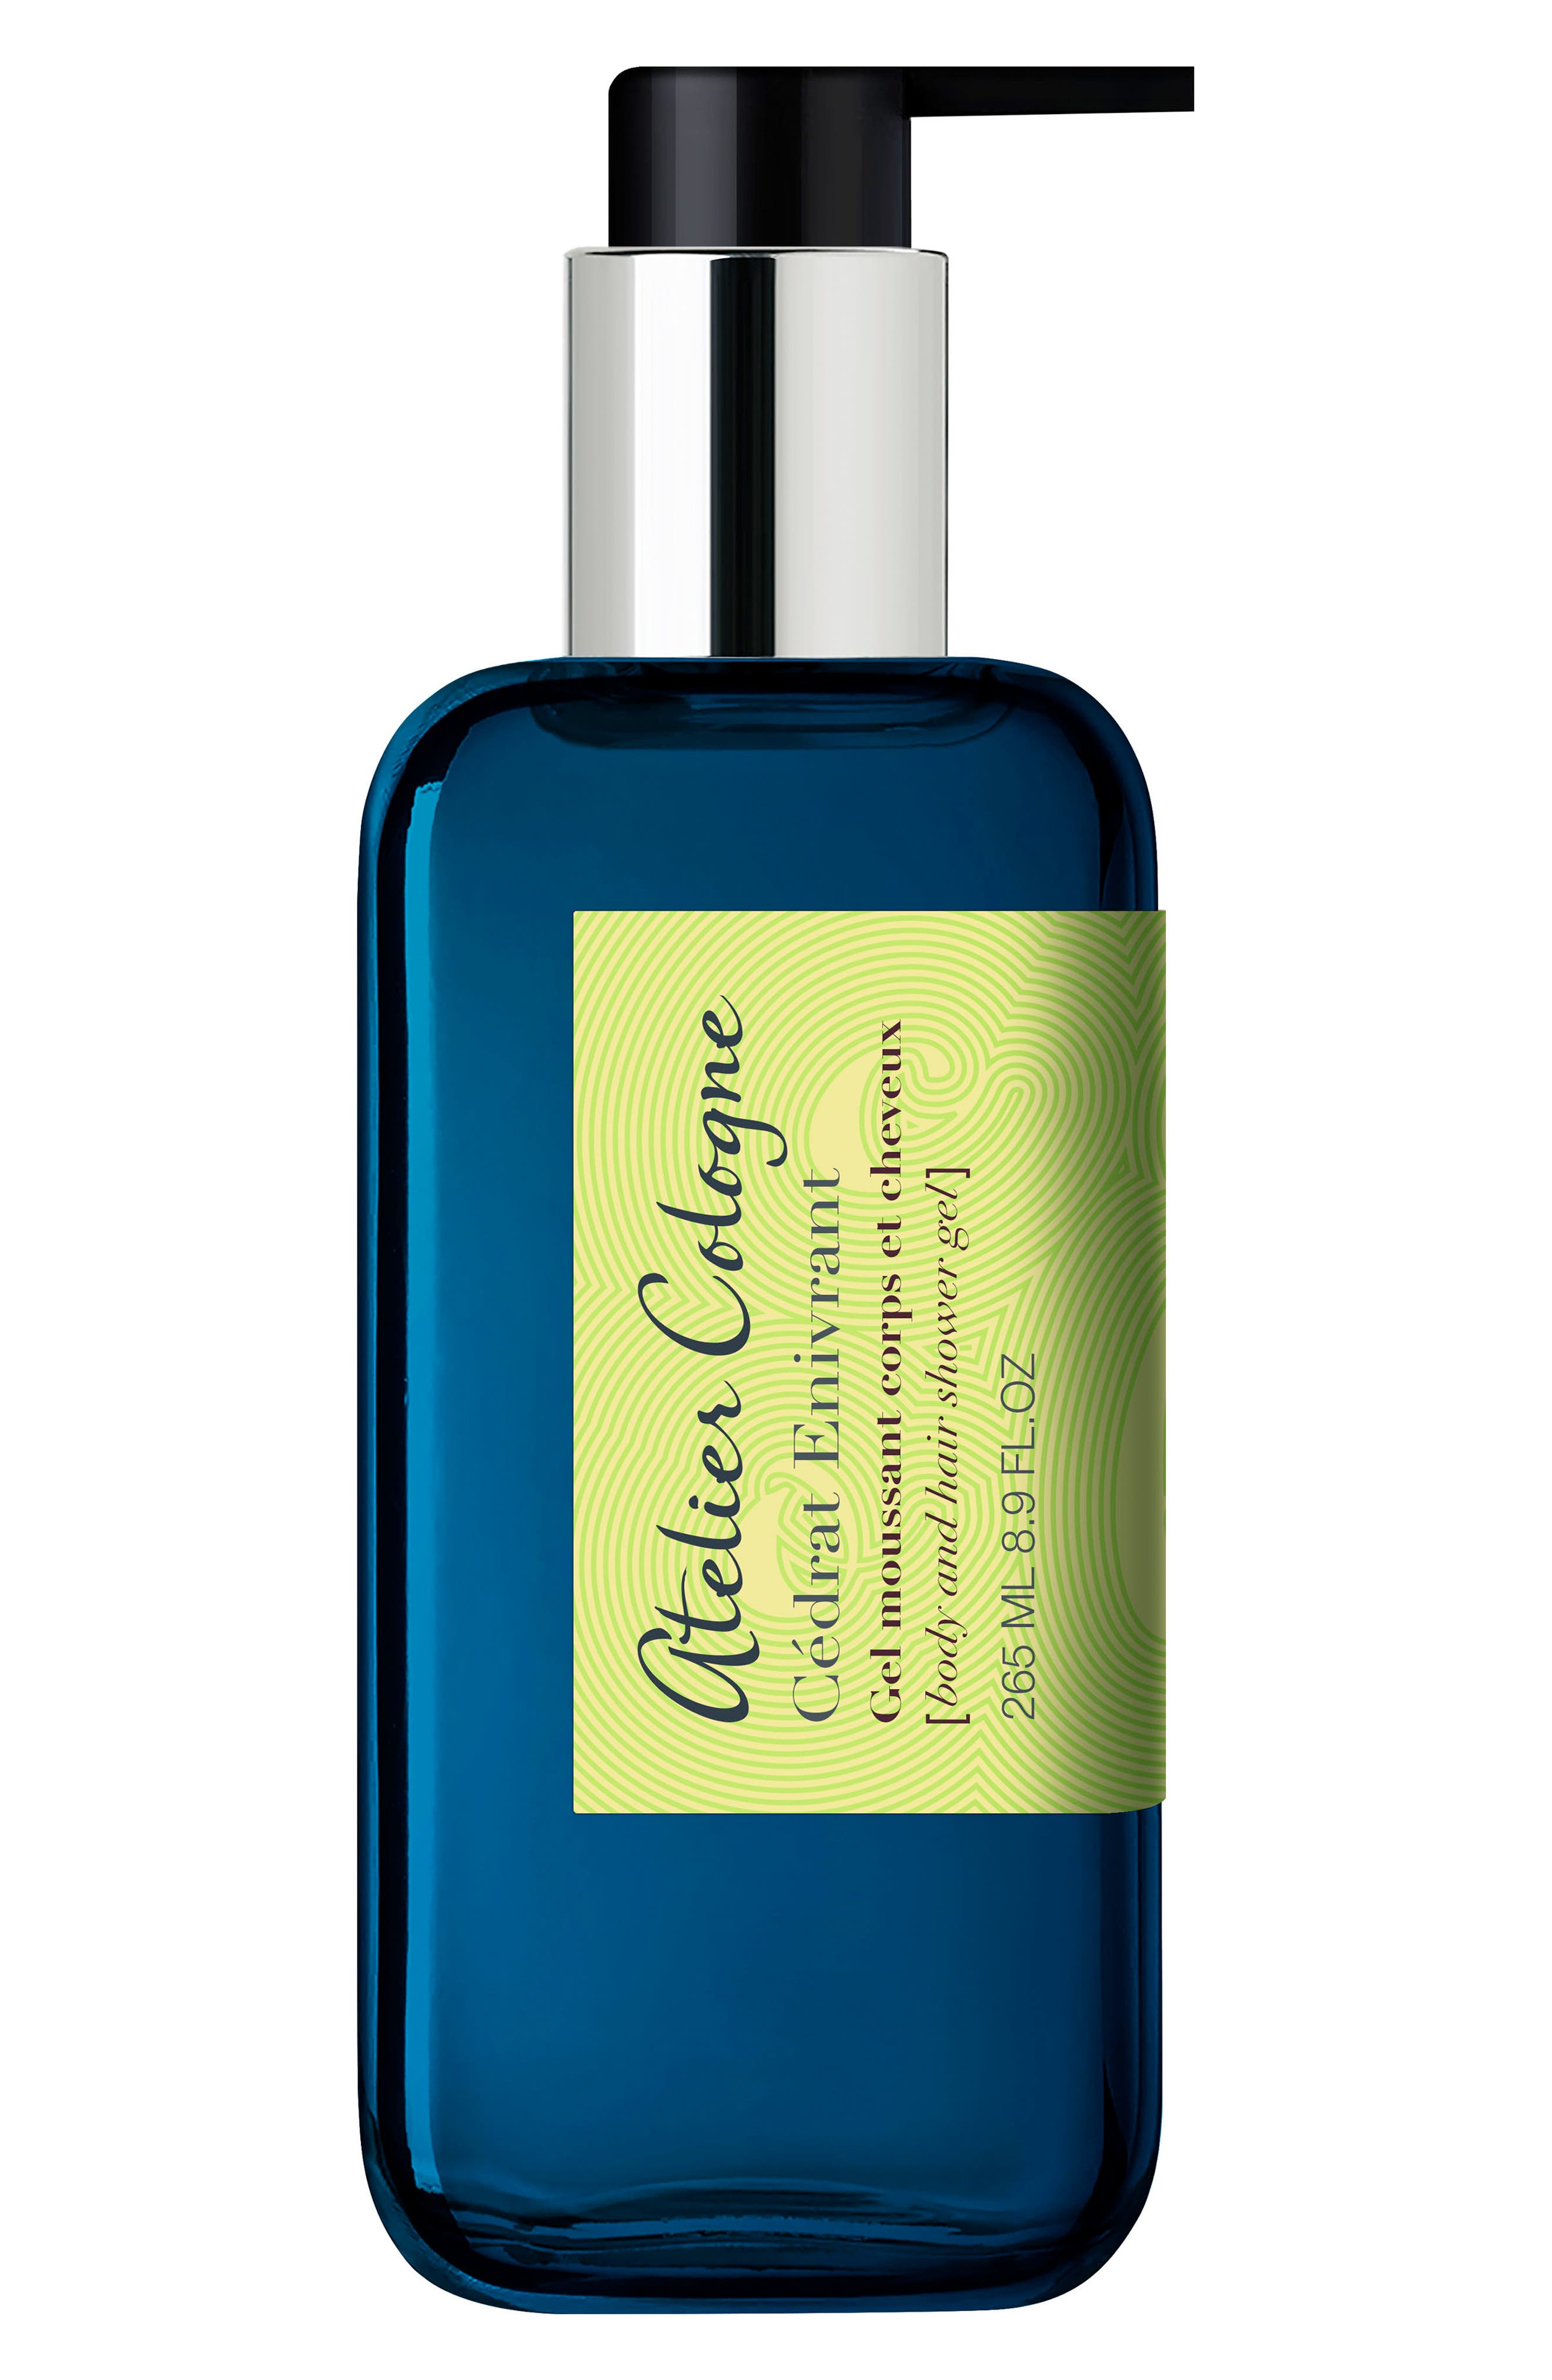 Main Image - Atelier Cologne Cédrat Envirant Body & Hair Shower Gel